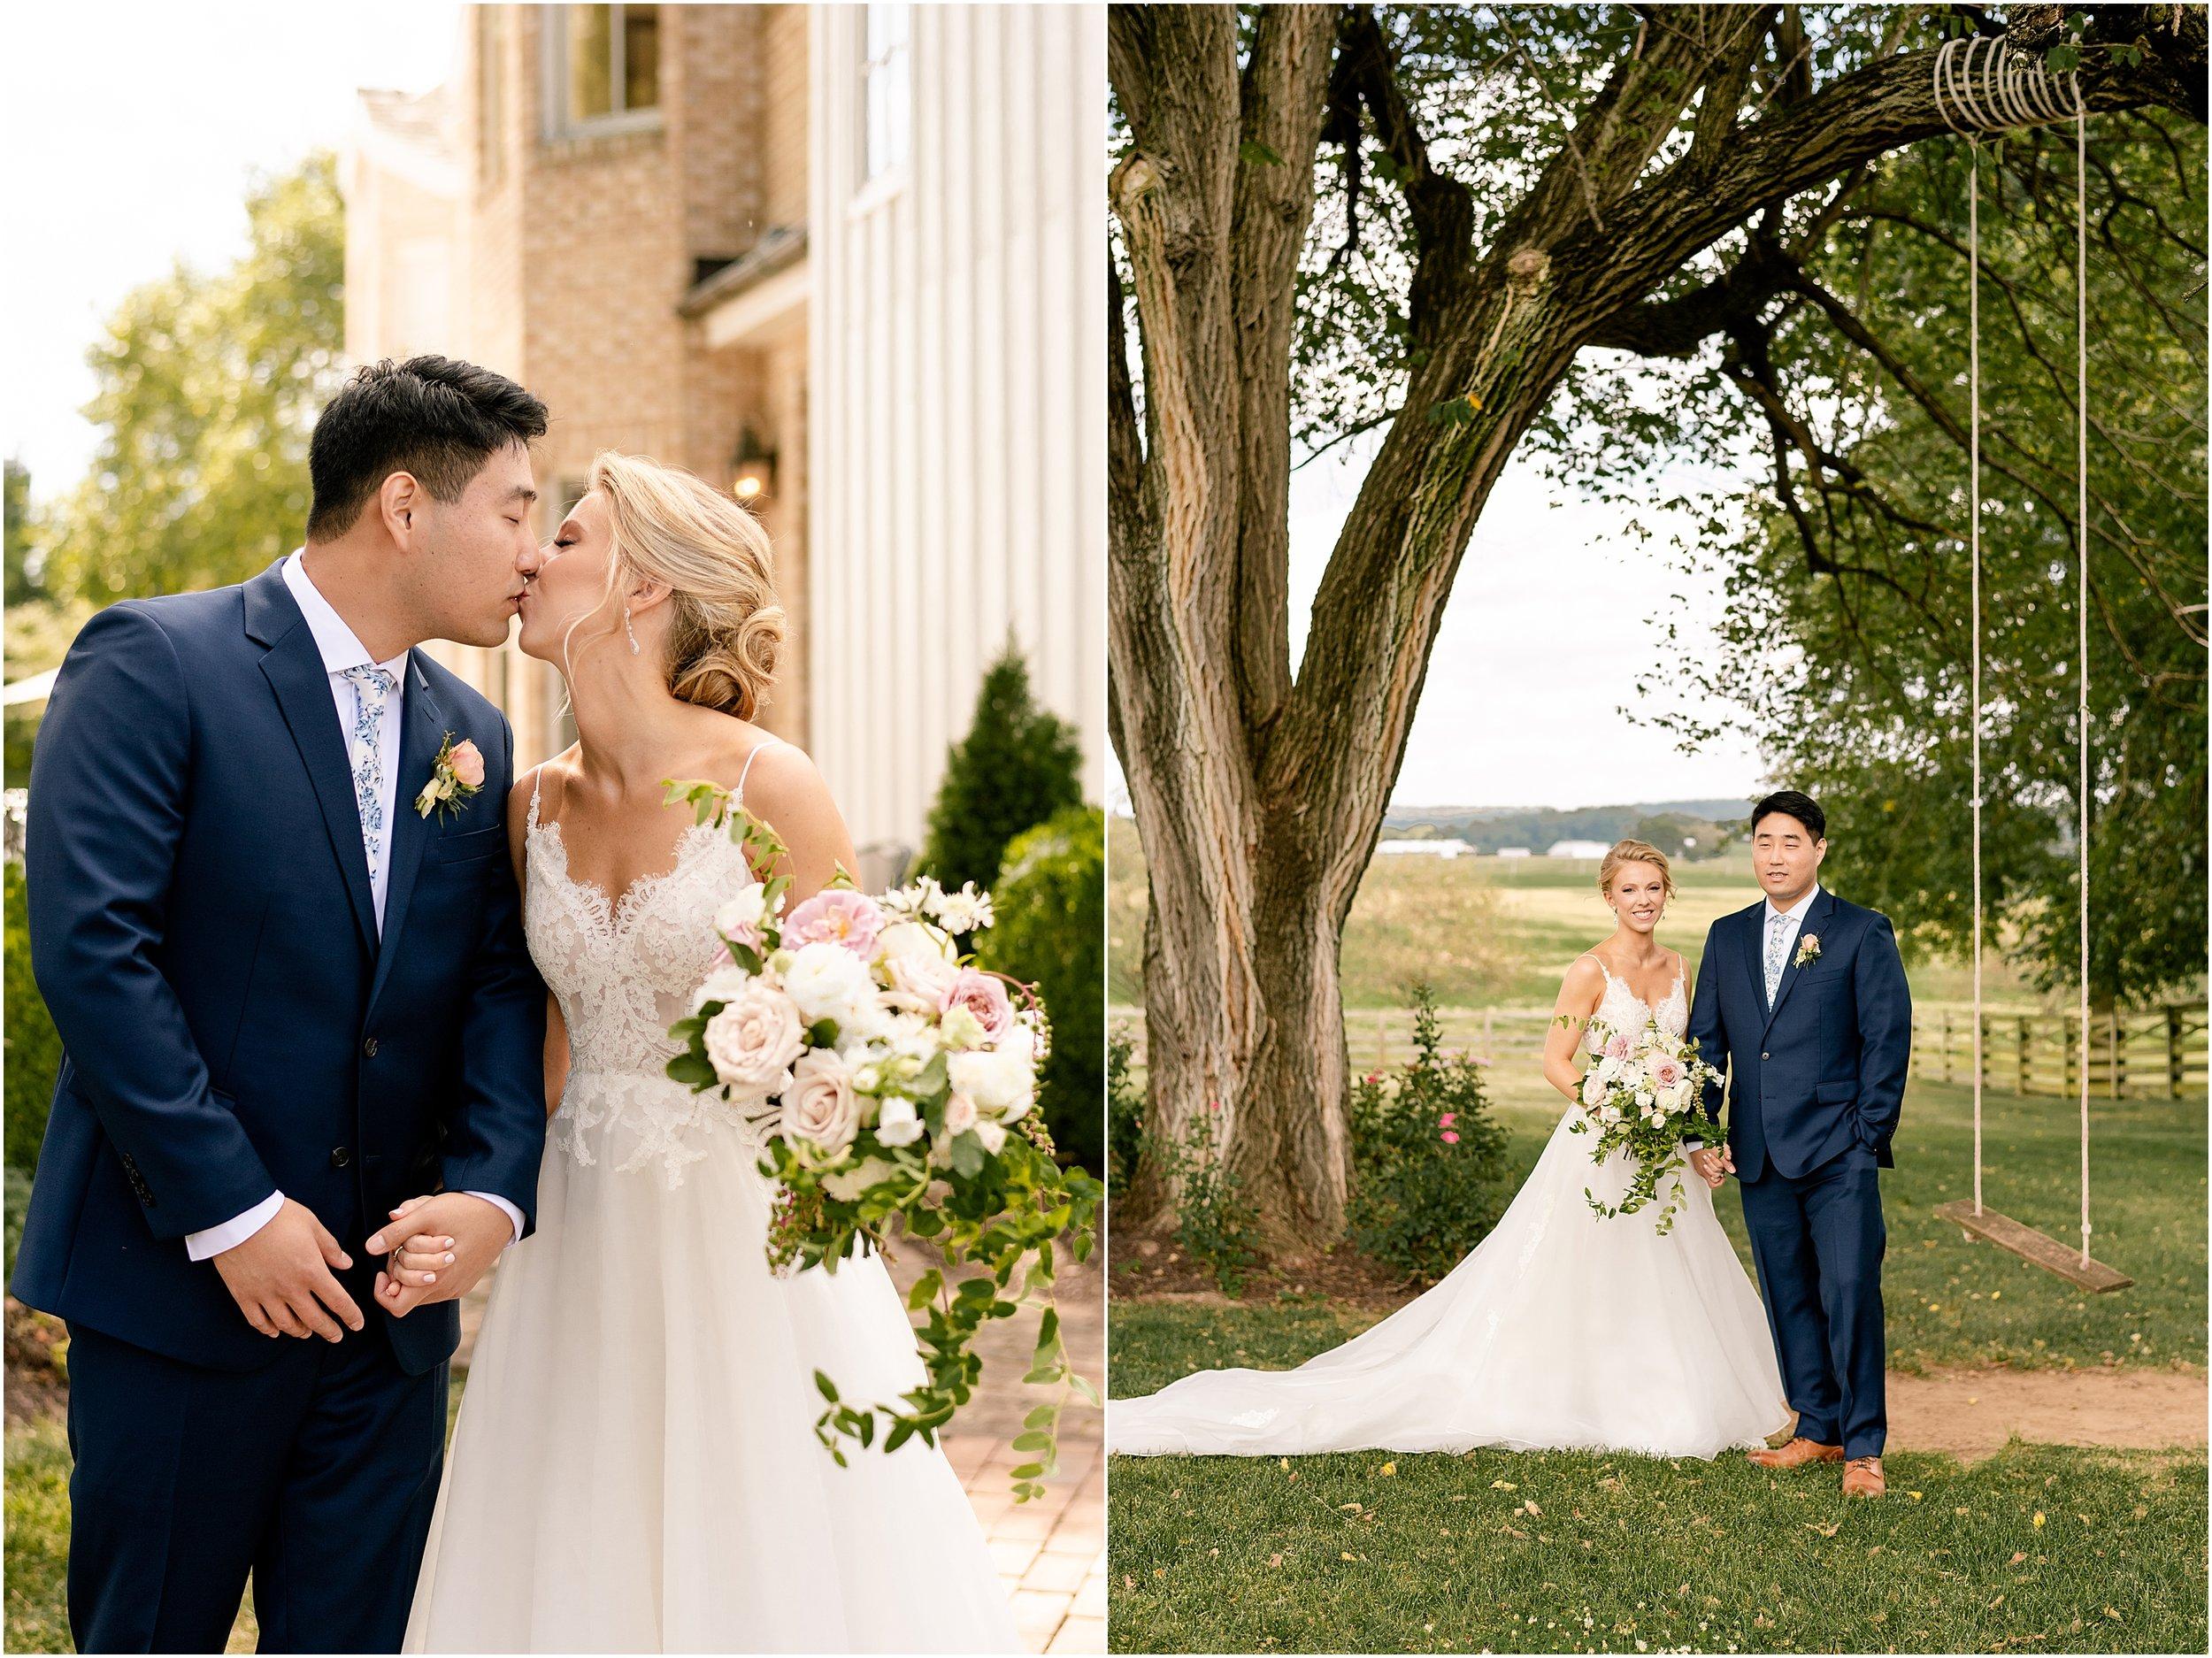 hannah leigh photography Walkers Overlook Wedding Walkersville MD_3495.jpg